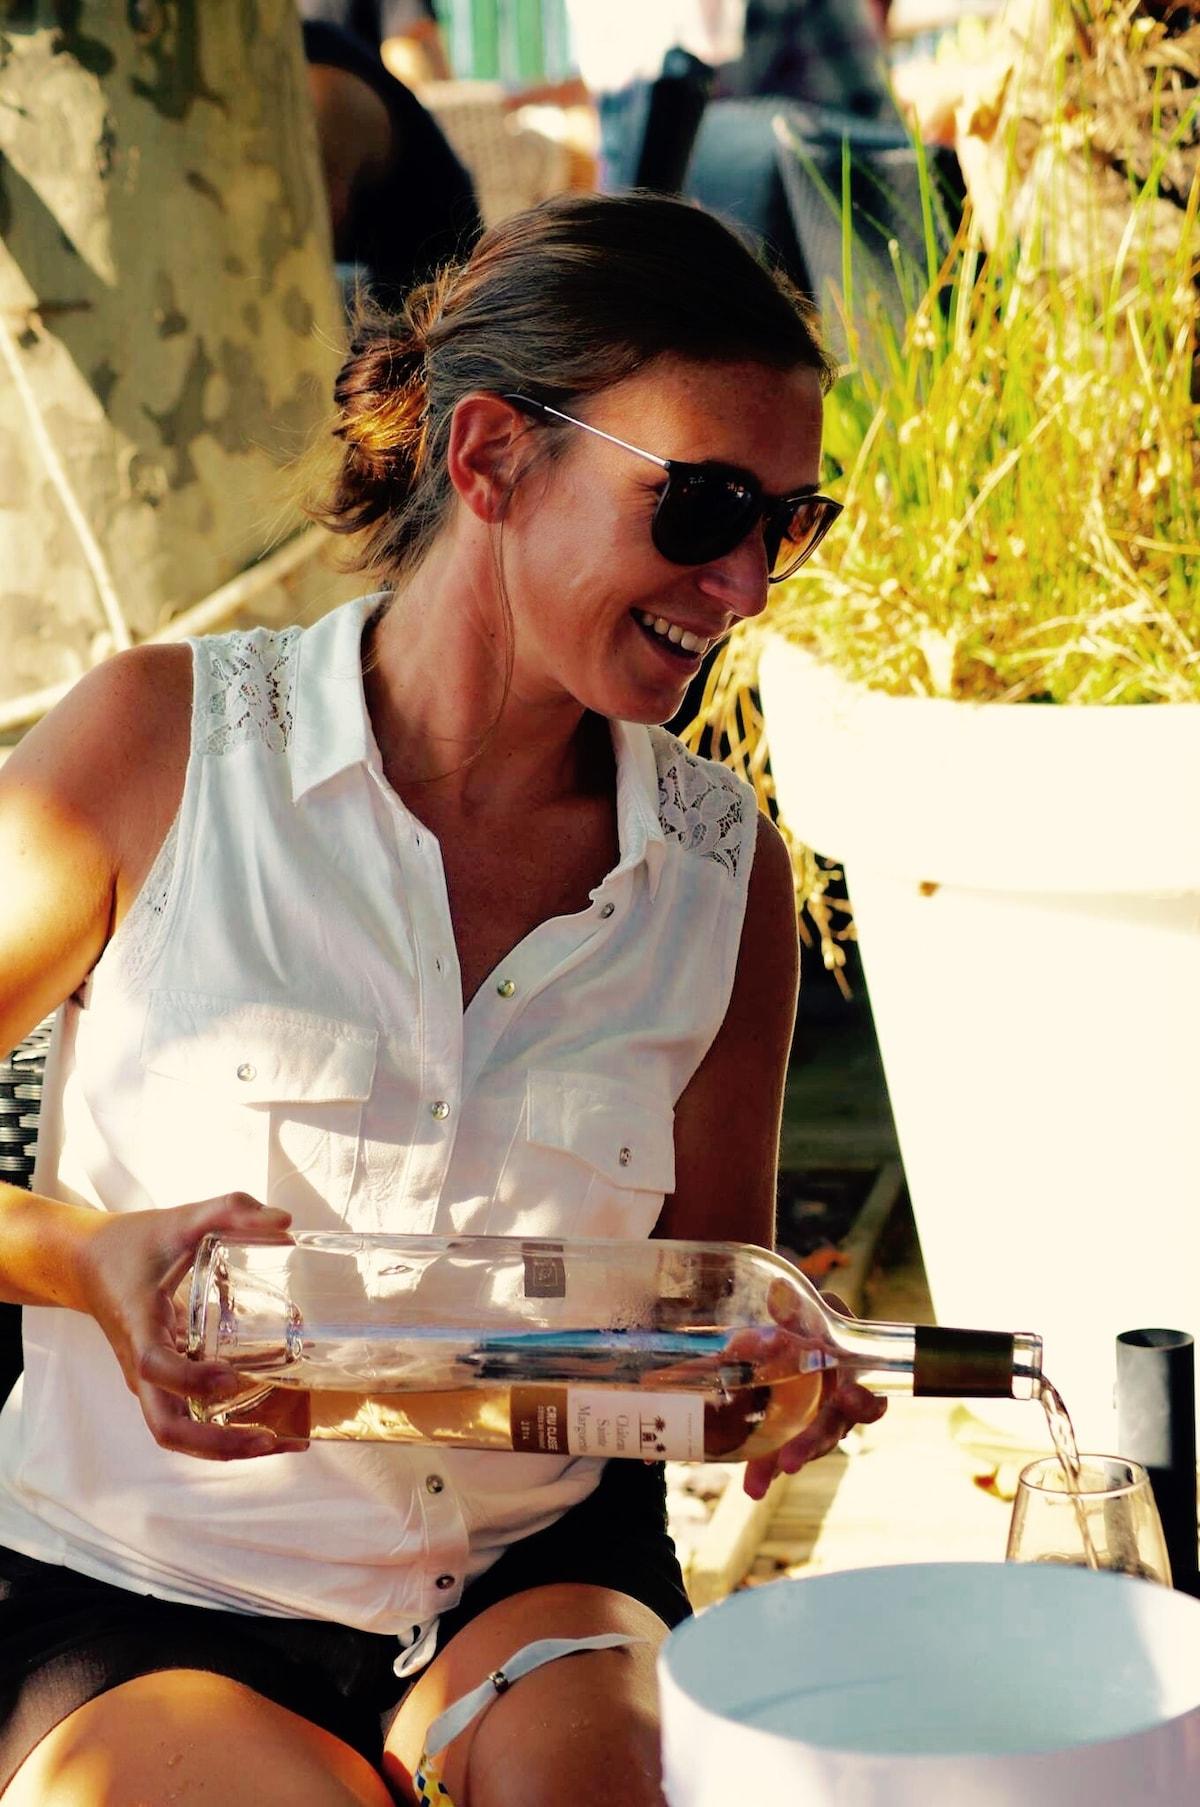 Claire From Geneva, Switzerland